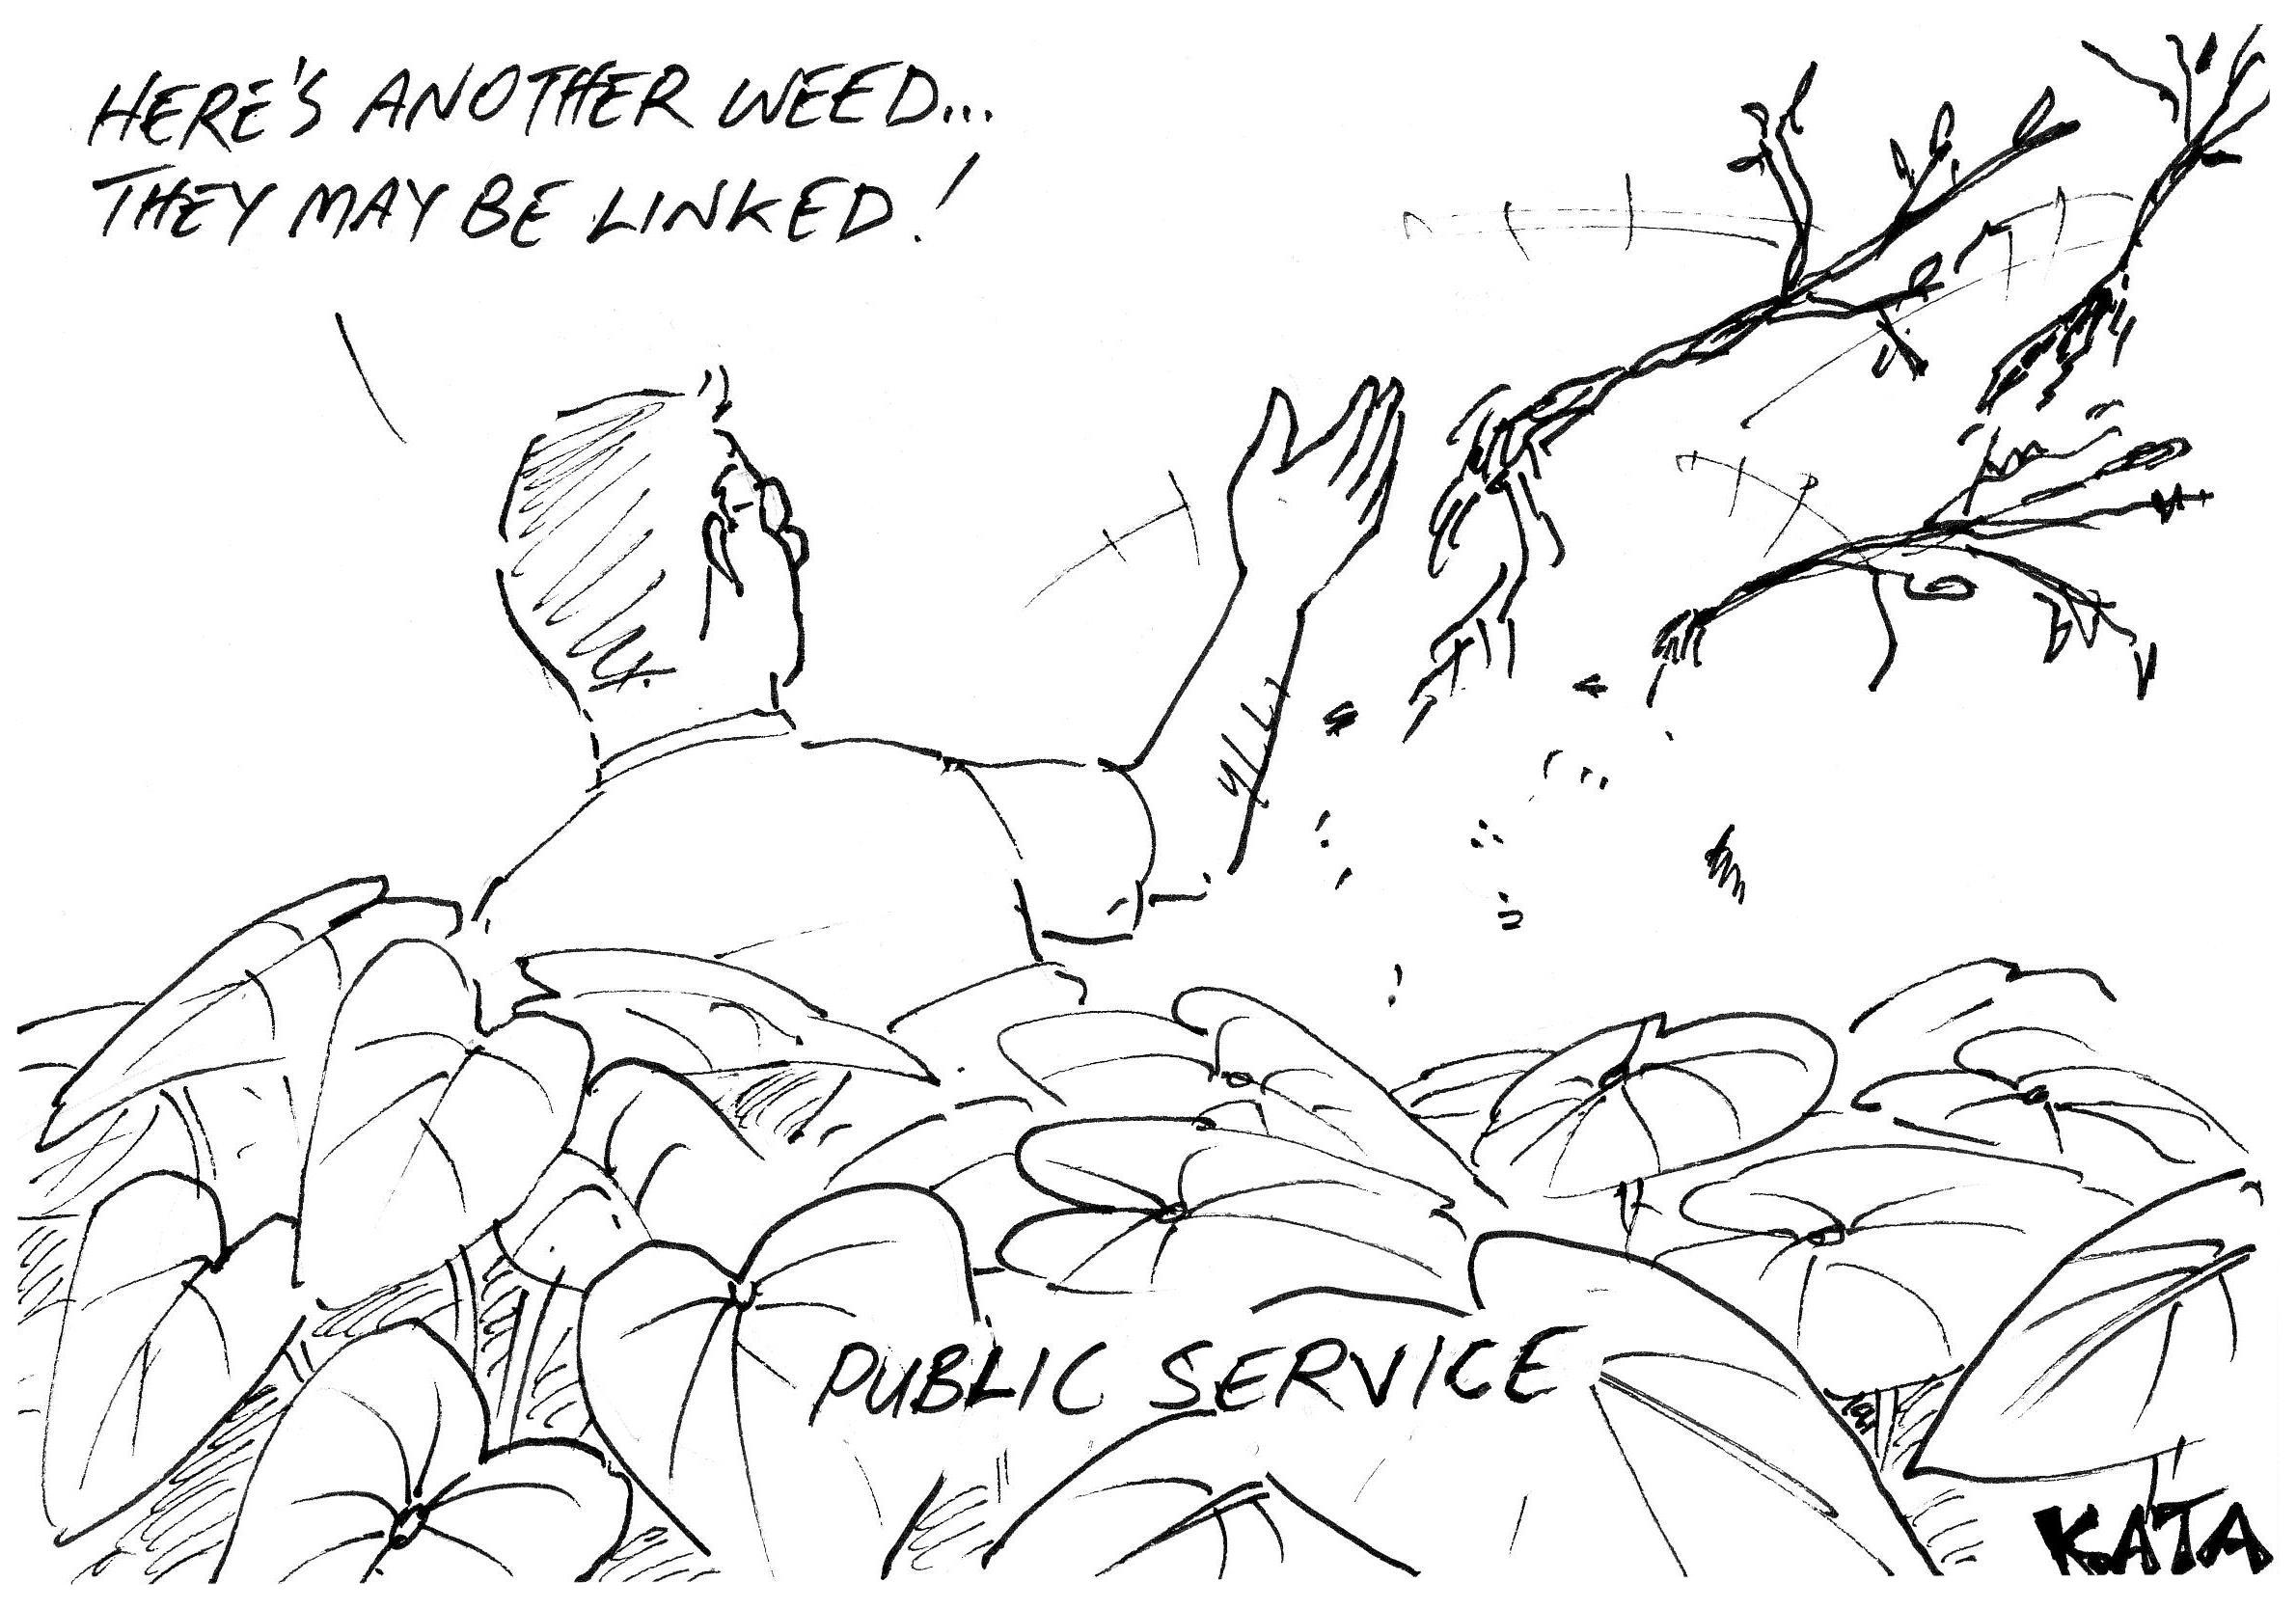 KATA: Public service weeding